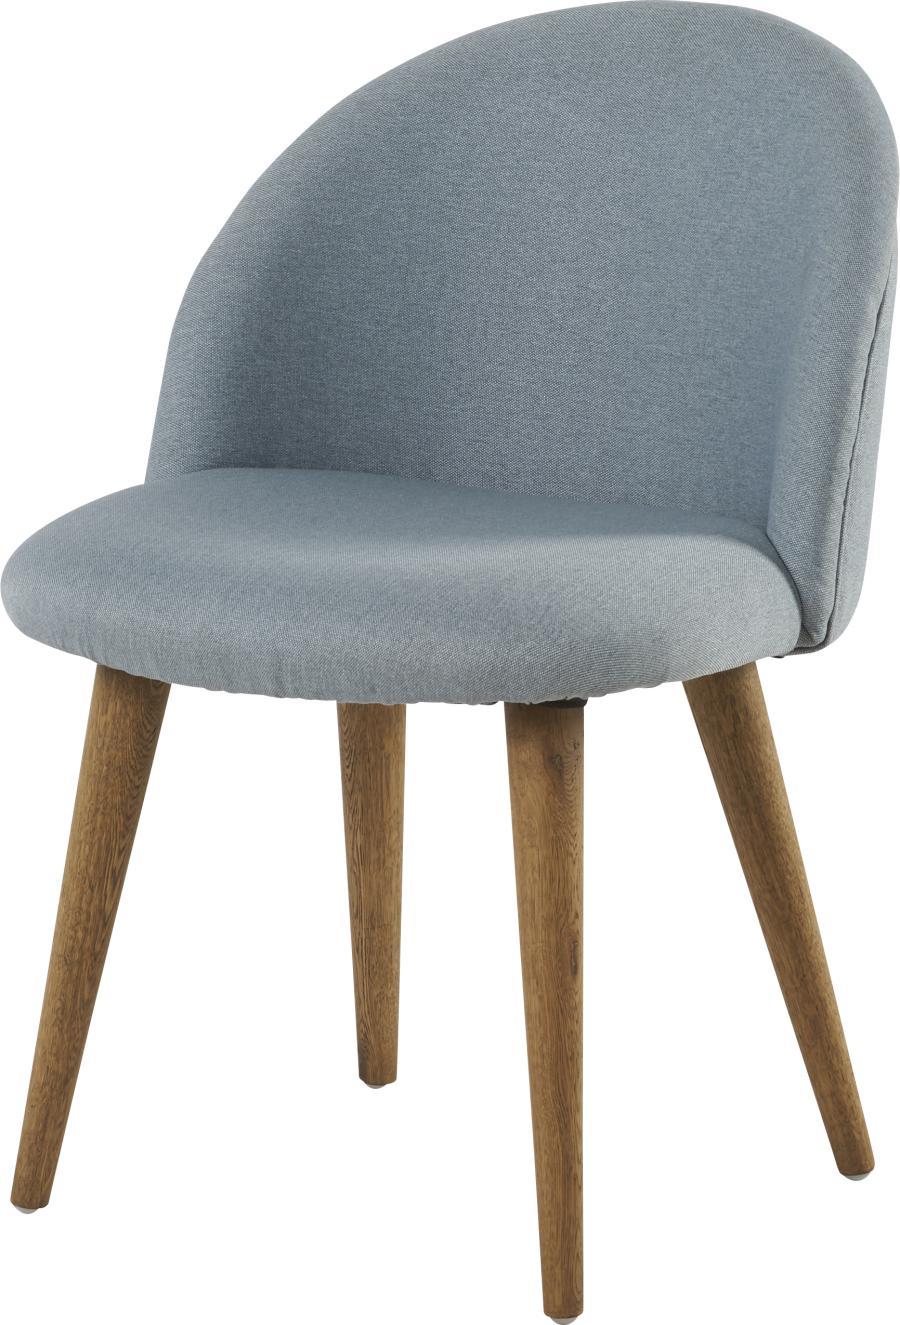 chaises scandinaves bois chaise scandinave blanche et bois naturel inspir hans j wegner chaise. Black Bedroom Furniture Sets. Home Design Ideas